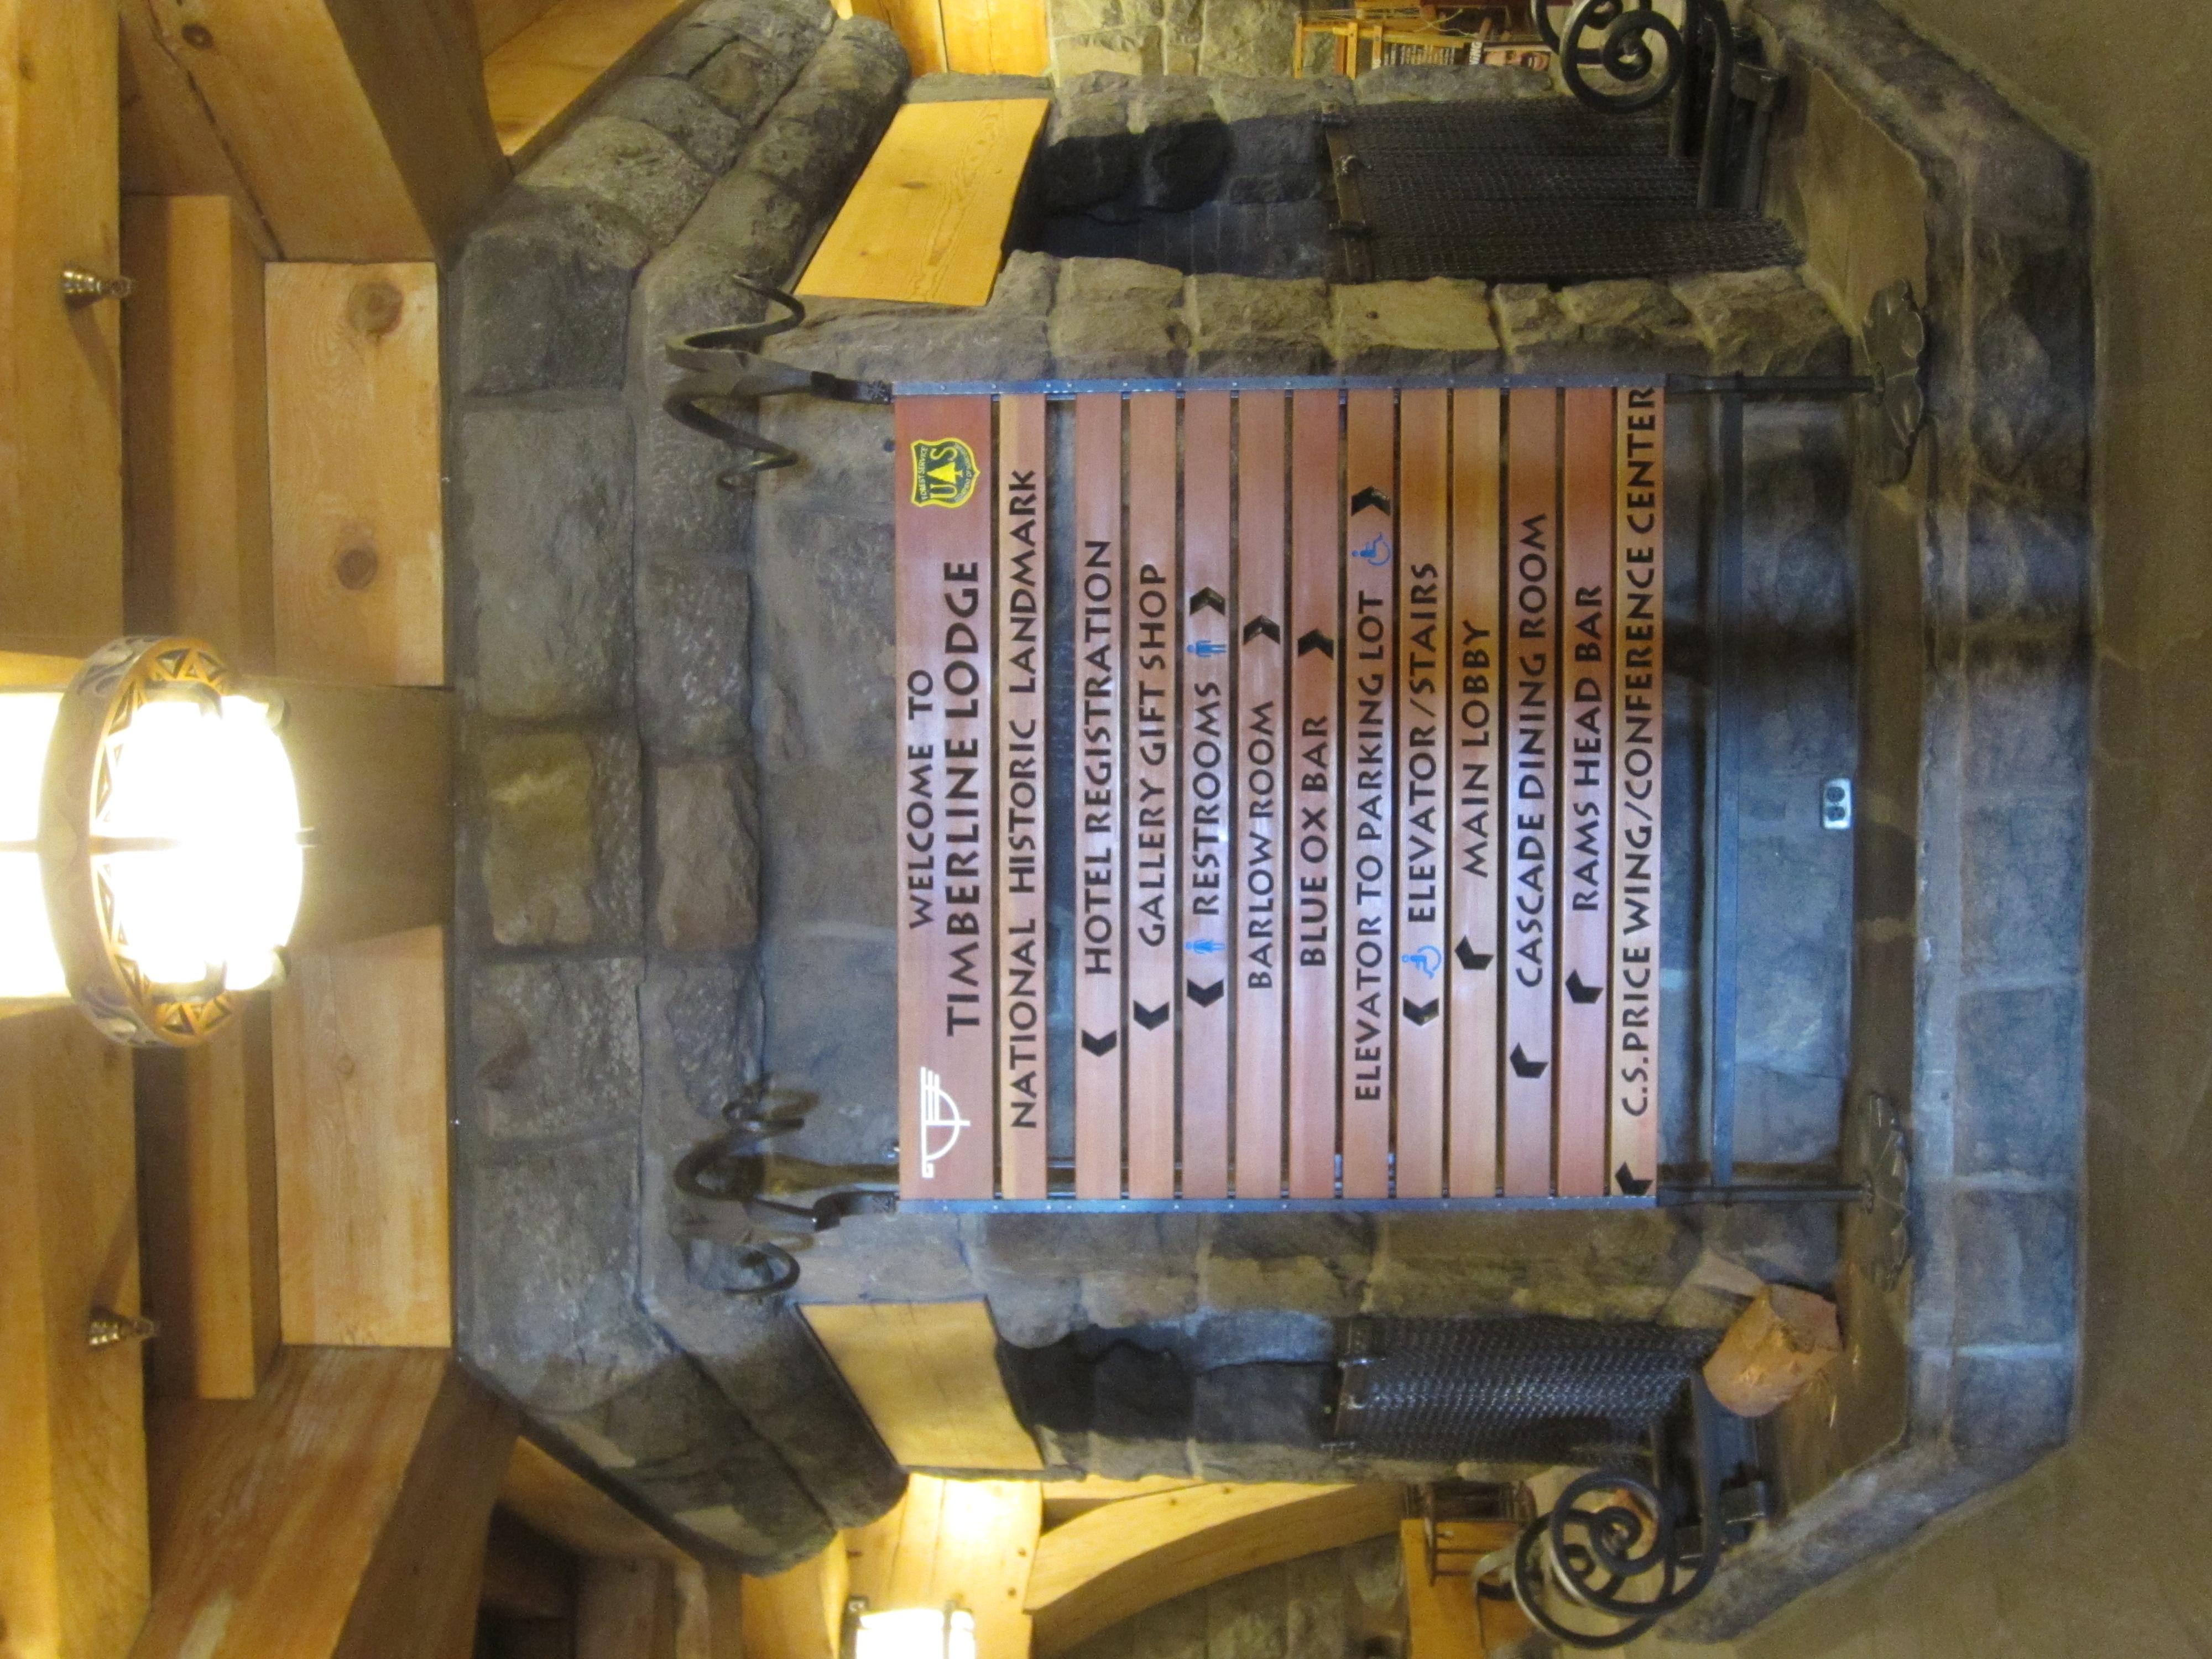 File:Timberline Lodge, Oregon (2017) - 08.jpg - Wikimedia Commons